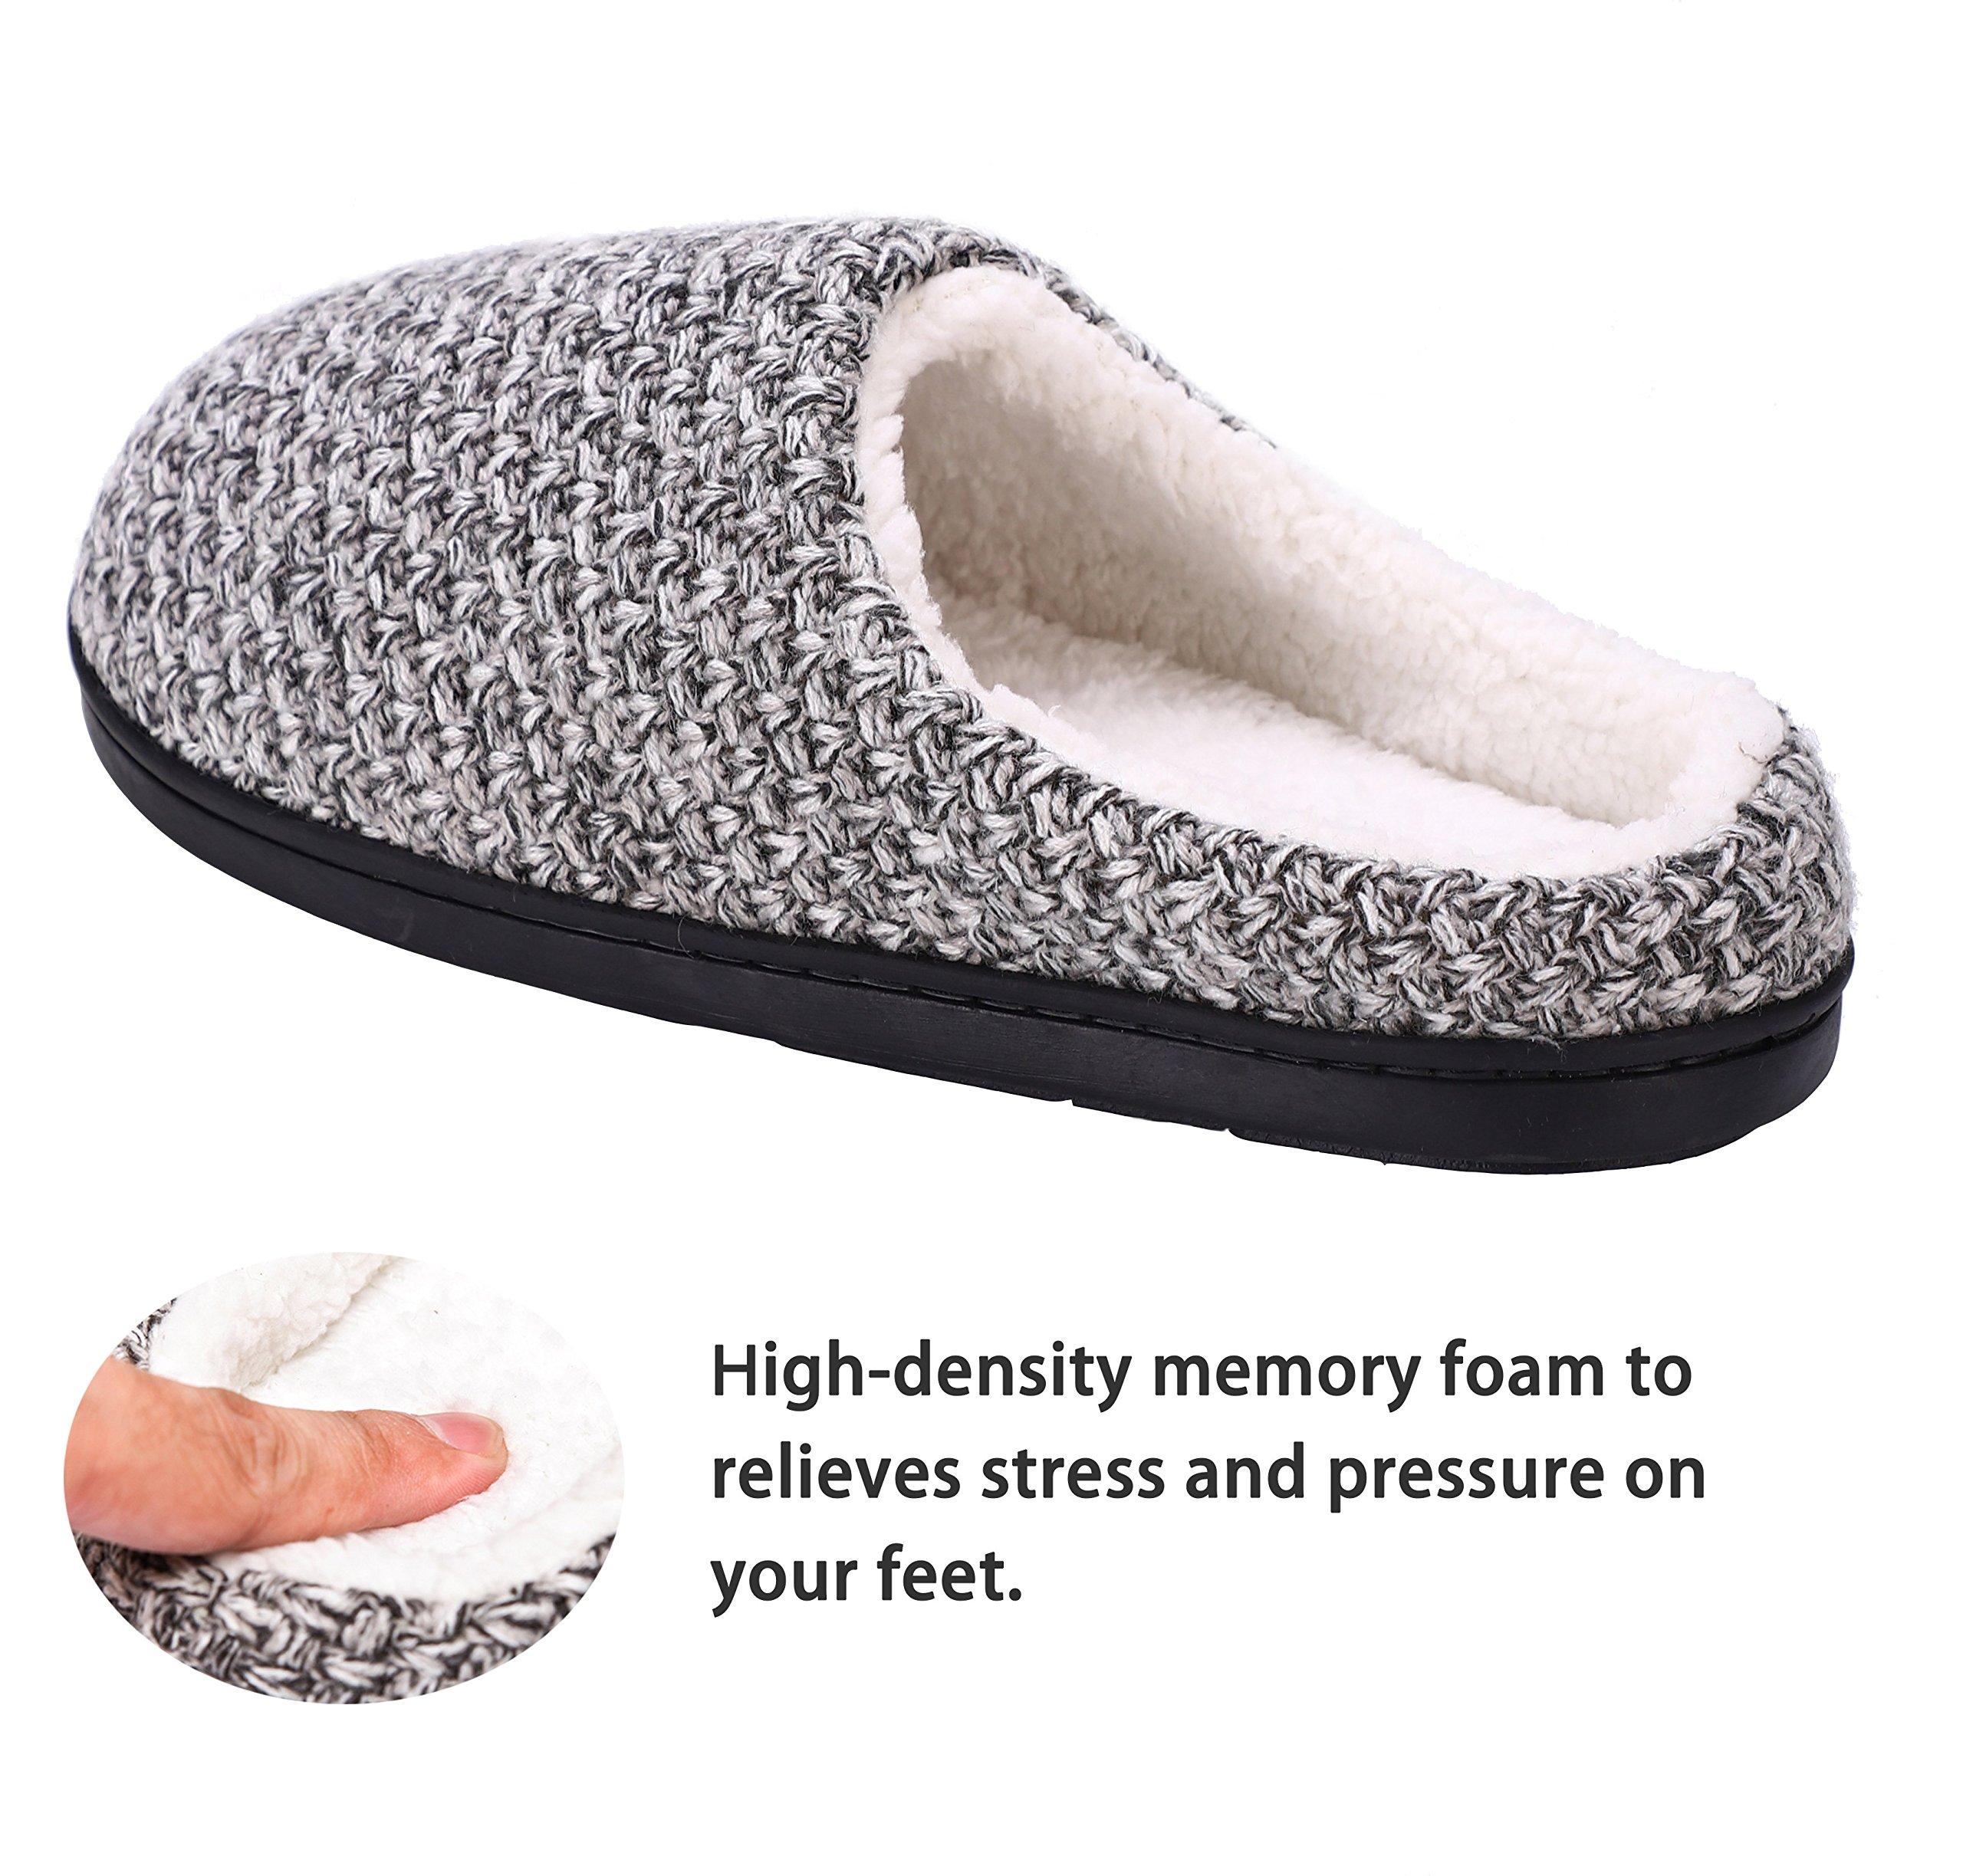 DRSLPAR House Memory Foam Slippers Comfort Plush Lining Slip-on Knit Indoor Outdoor Shoes for Men Women(Grey-Beige X-Large) by DRSLPAR (Image #3)